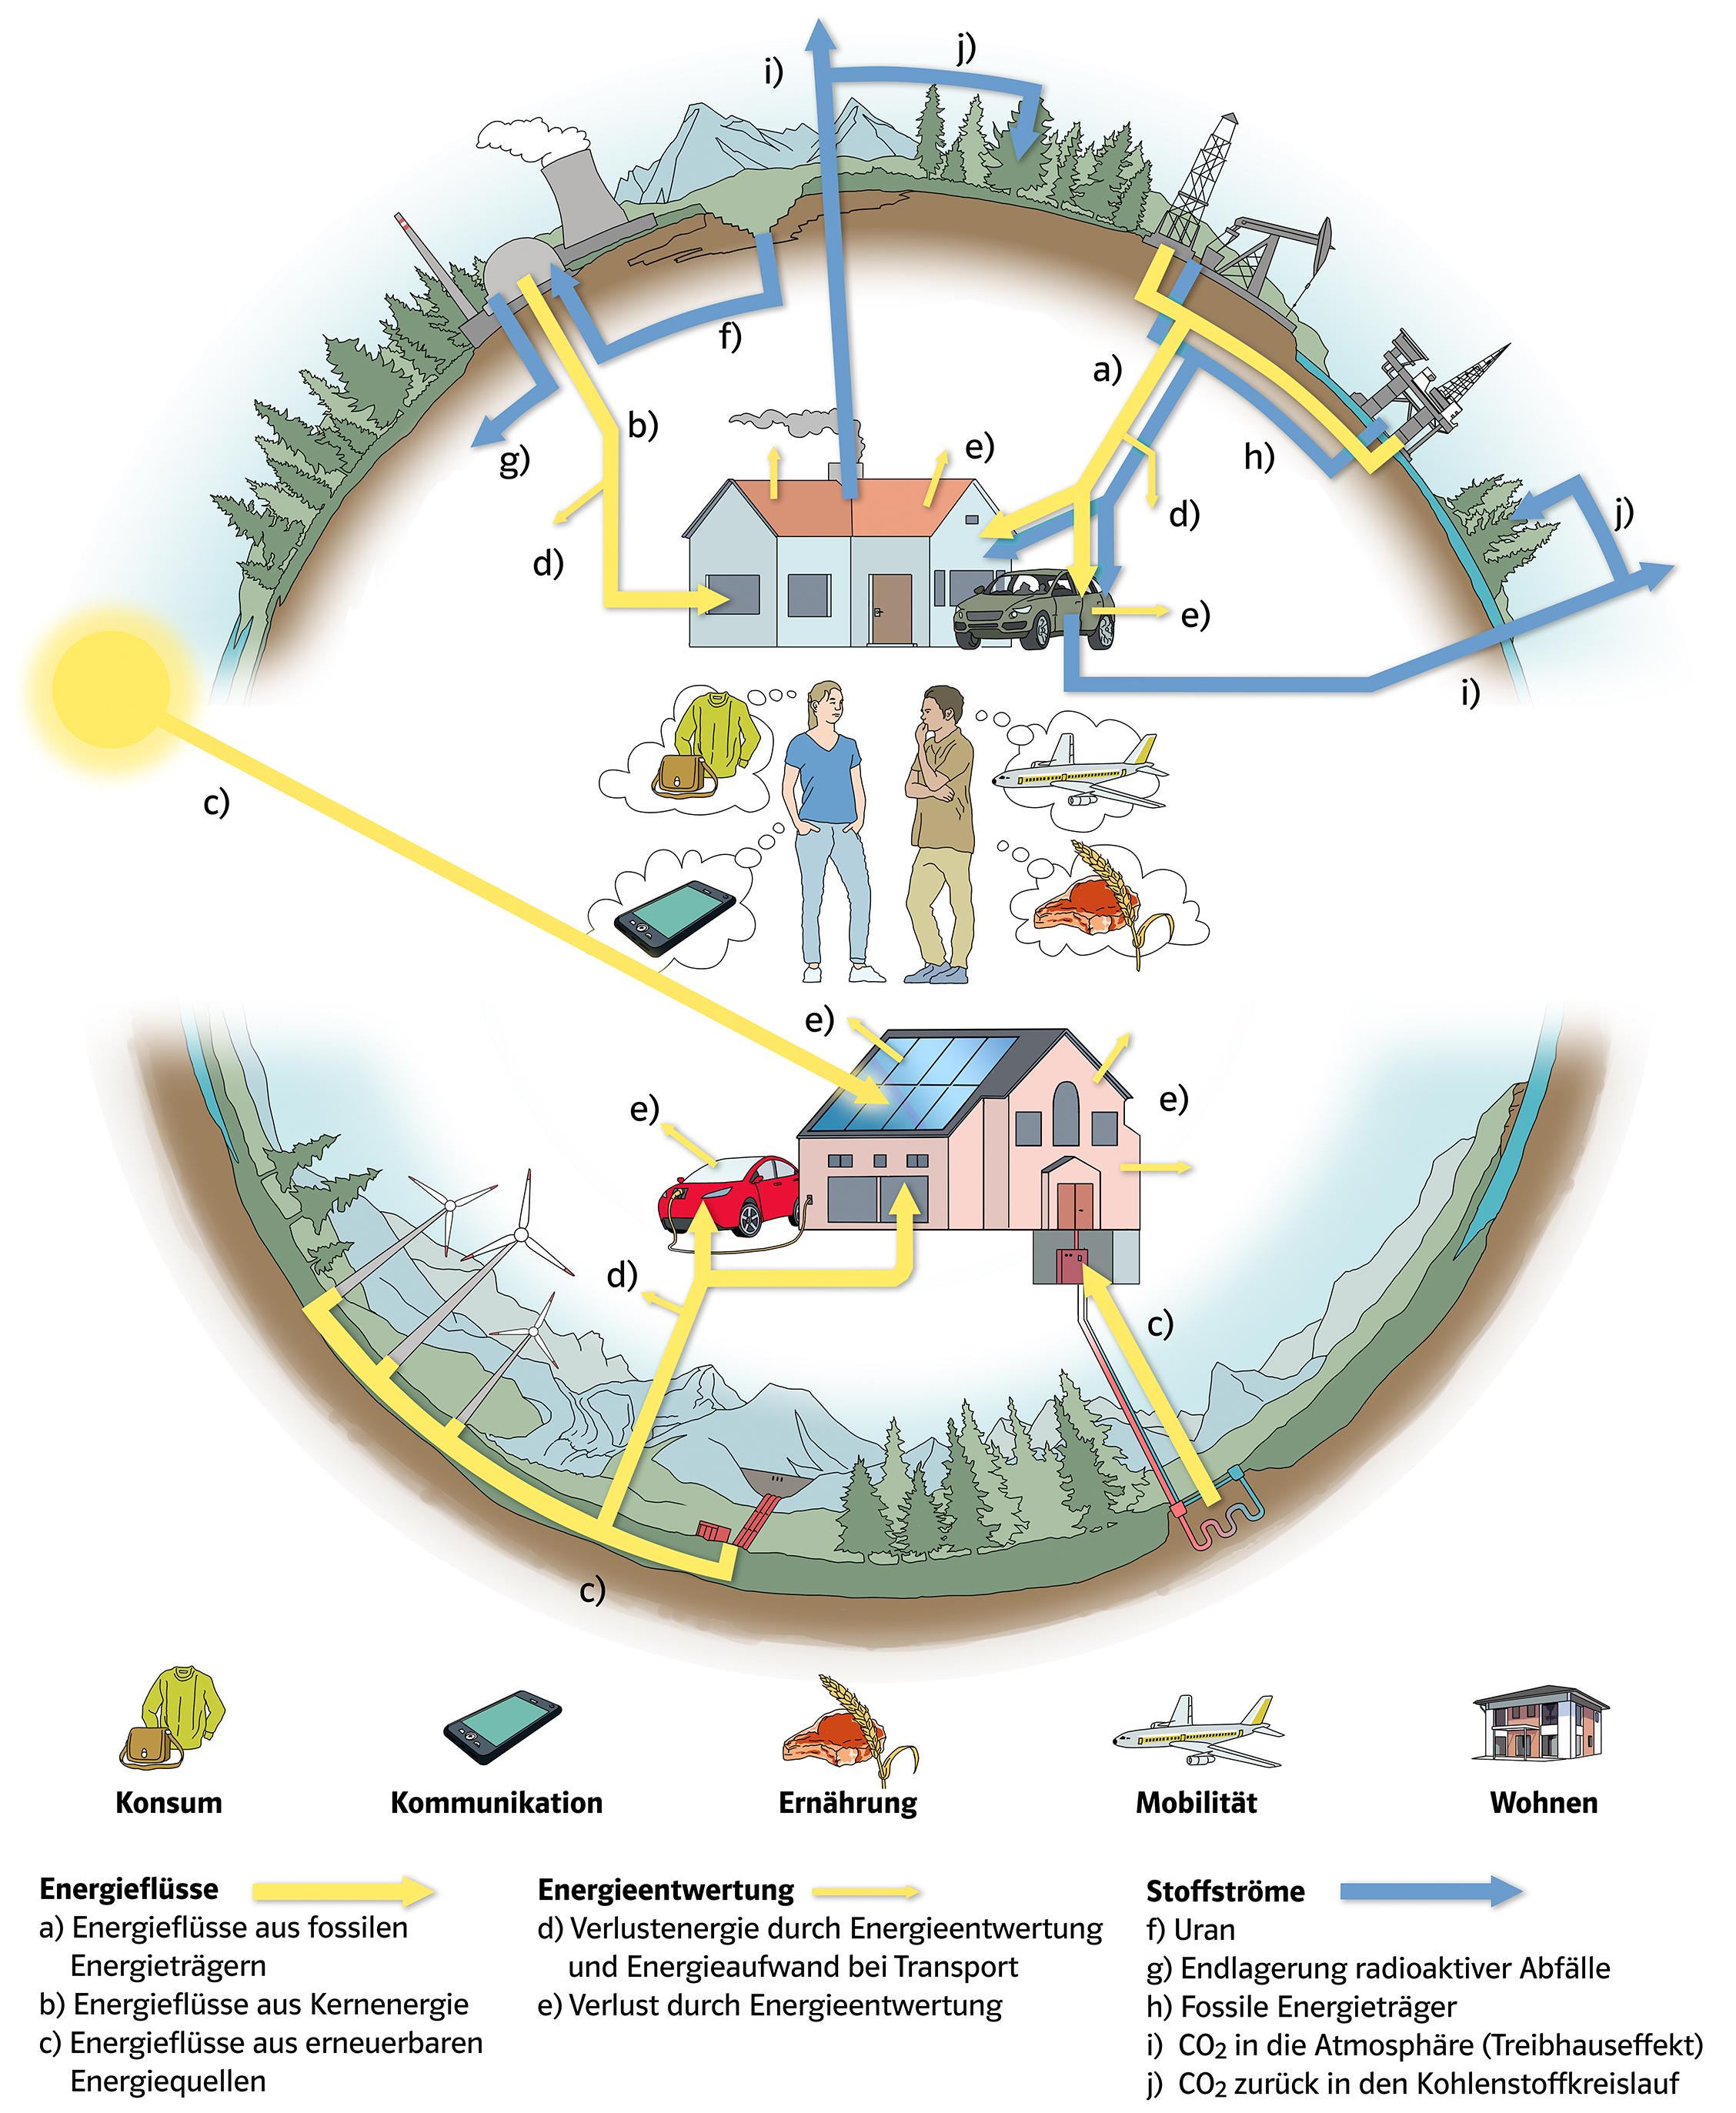 29 Prisma Grafik Thema 18 081 Energieressourcen volery